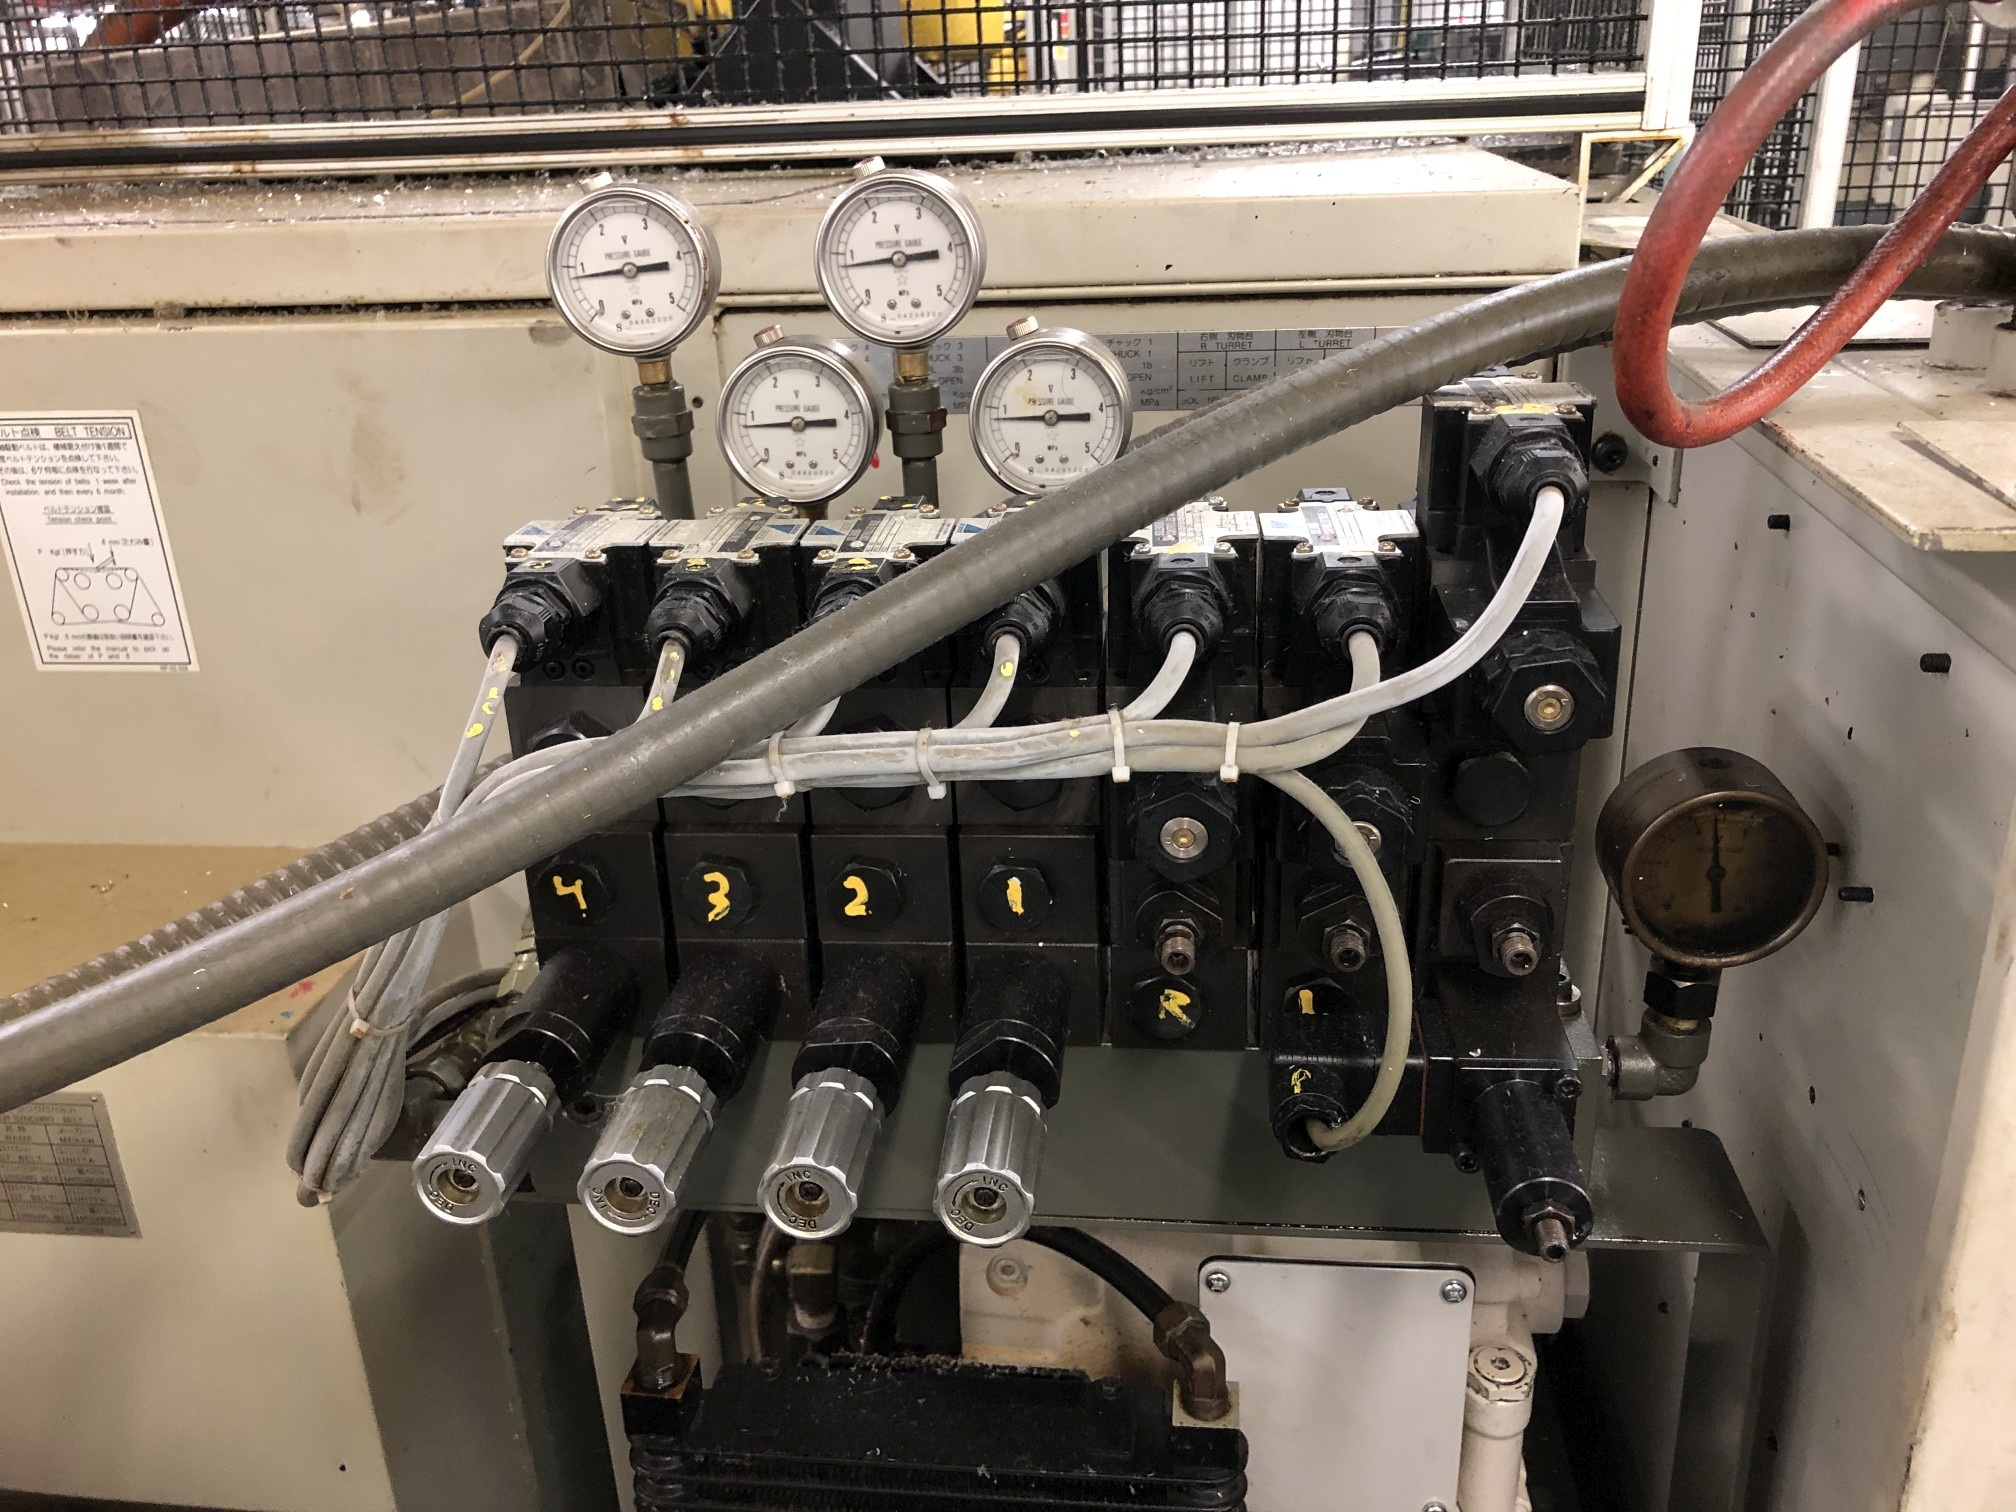 1999 Kitako MT4-200M Multi-Spindle CNC Turning Mill - Image 13 of 19